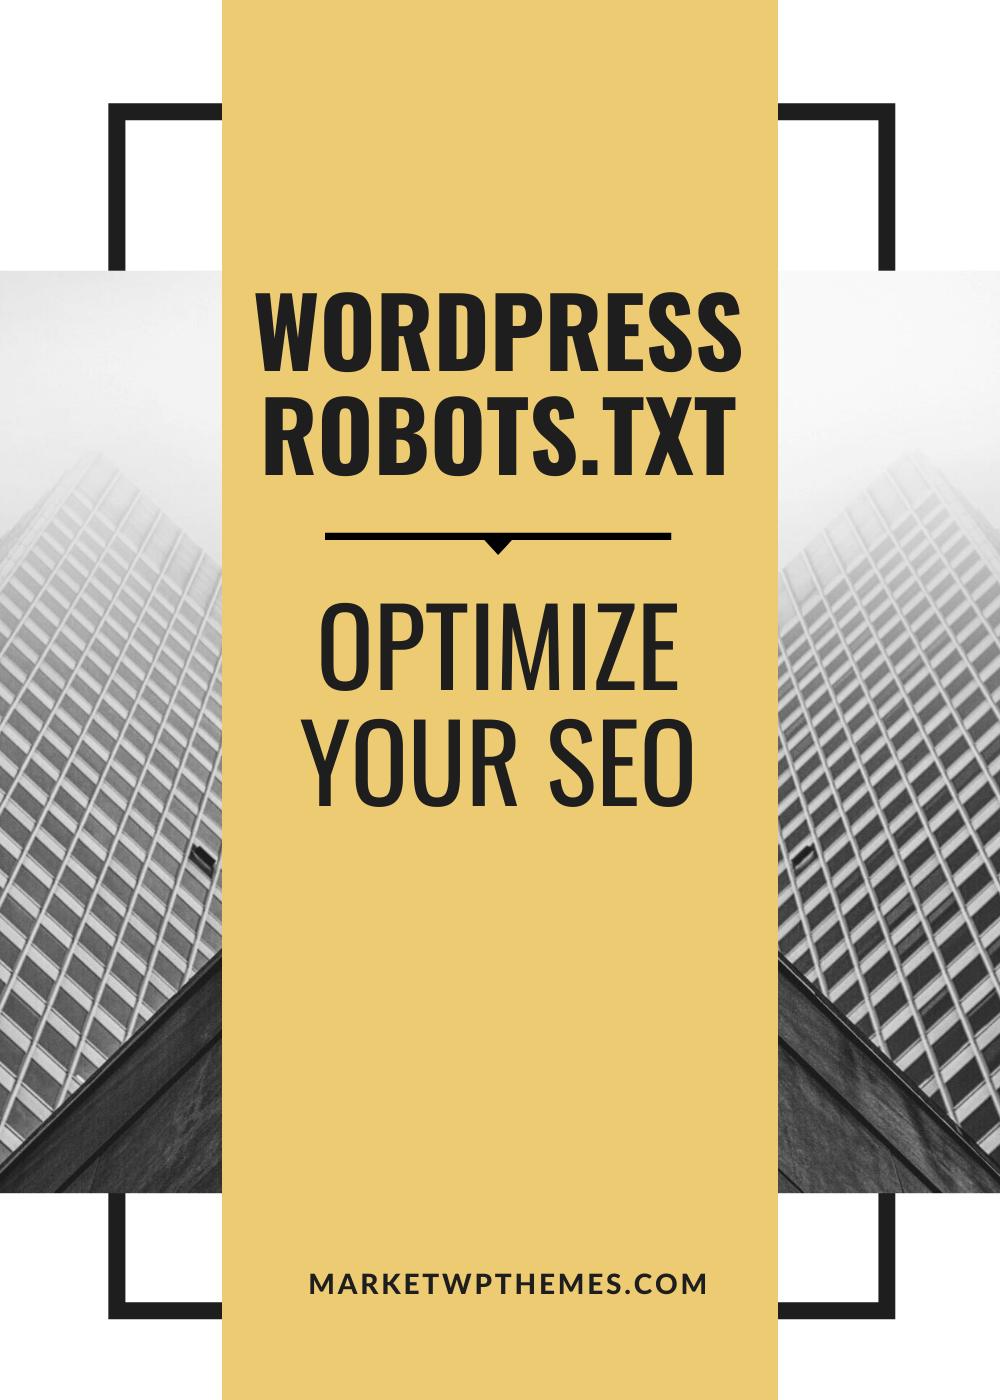 WordPress Robots.txt - Optimize Your SEO Post